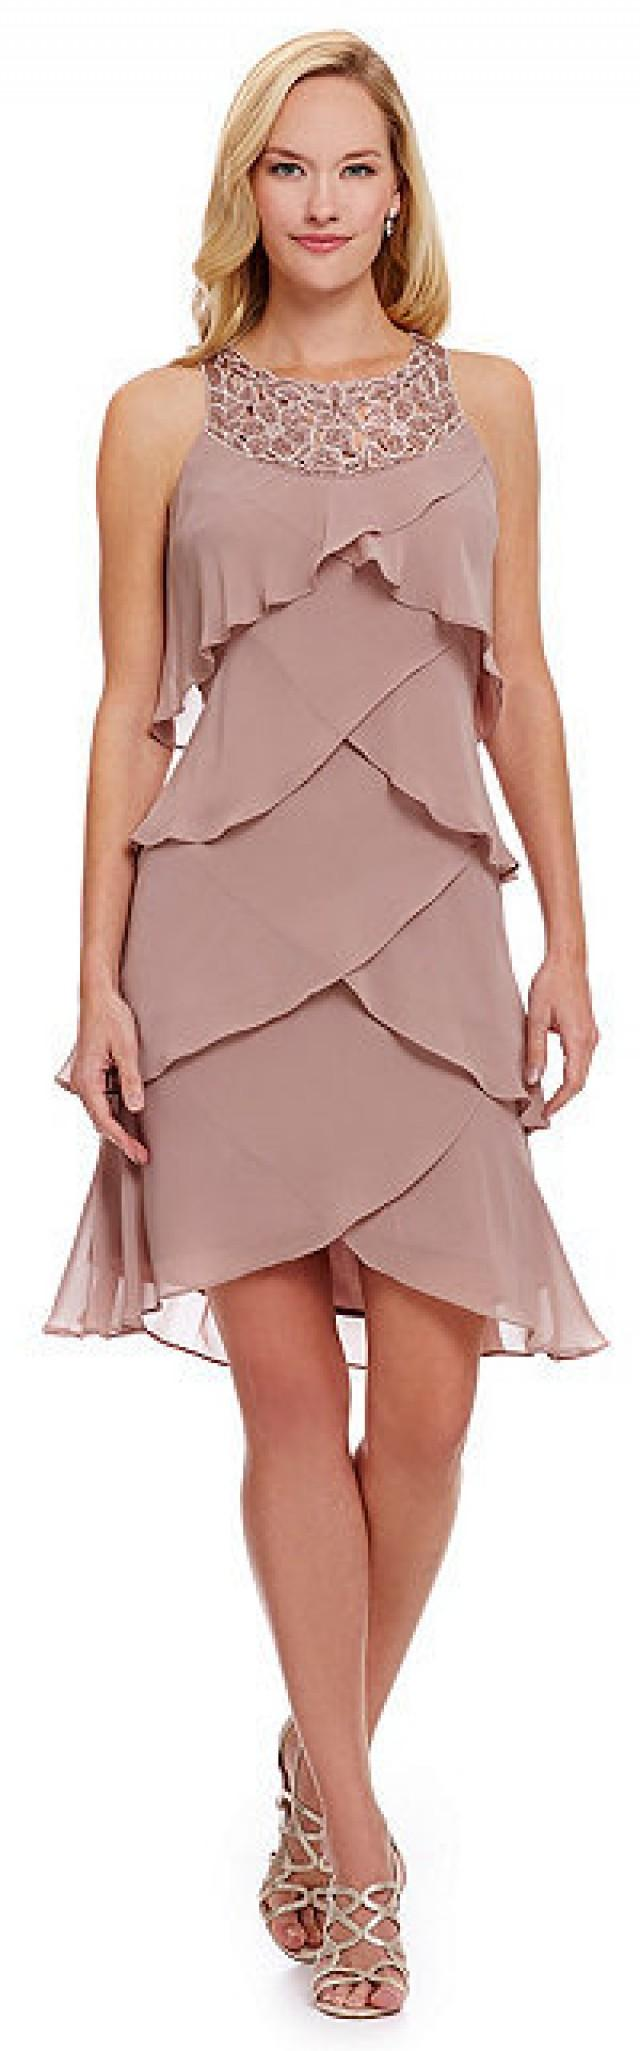 Sl sl fashion dresses - Sl Sl Fashion Dresses 9